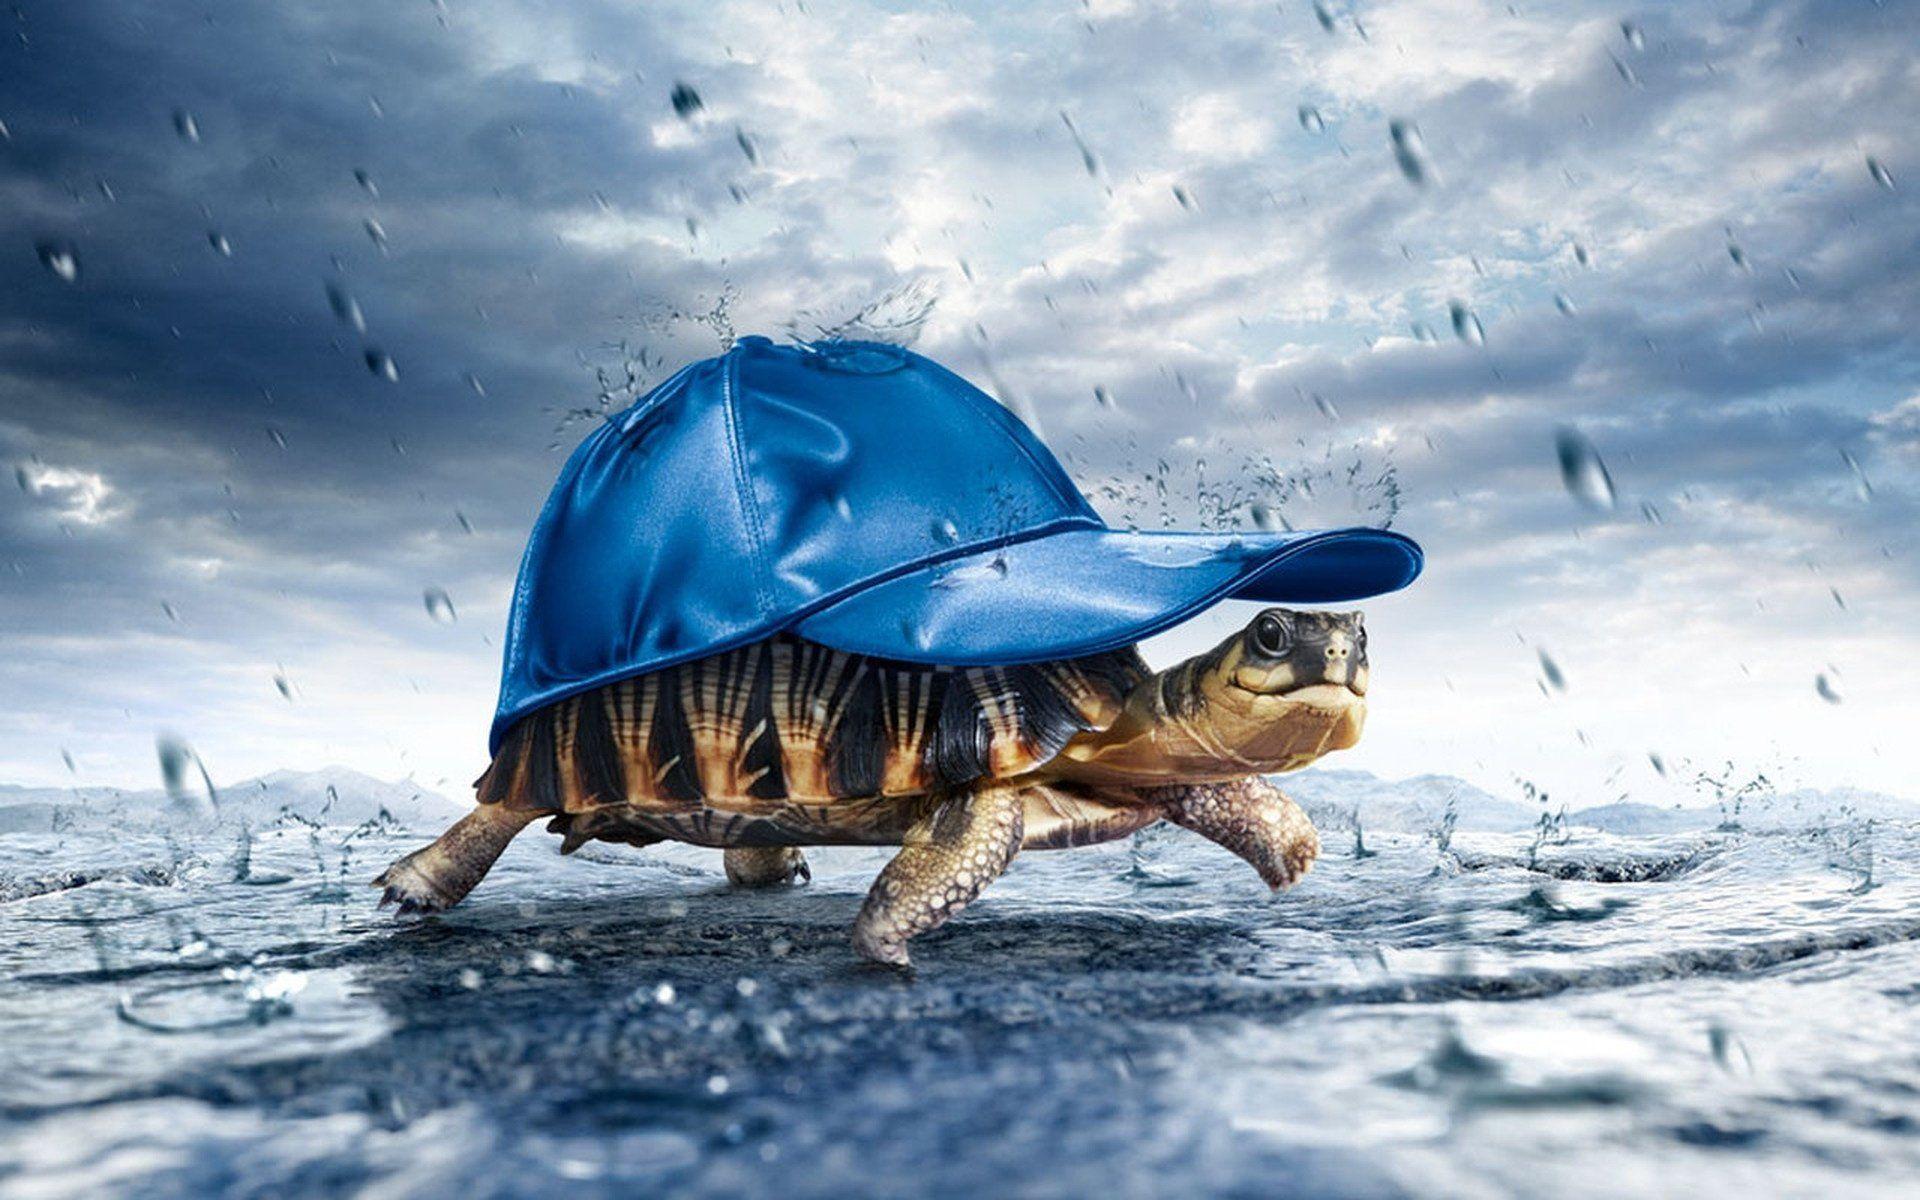 photos of turtles